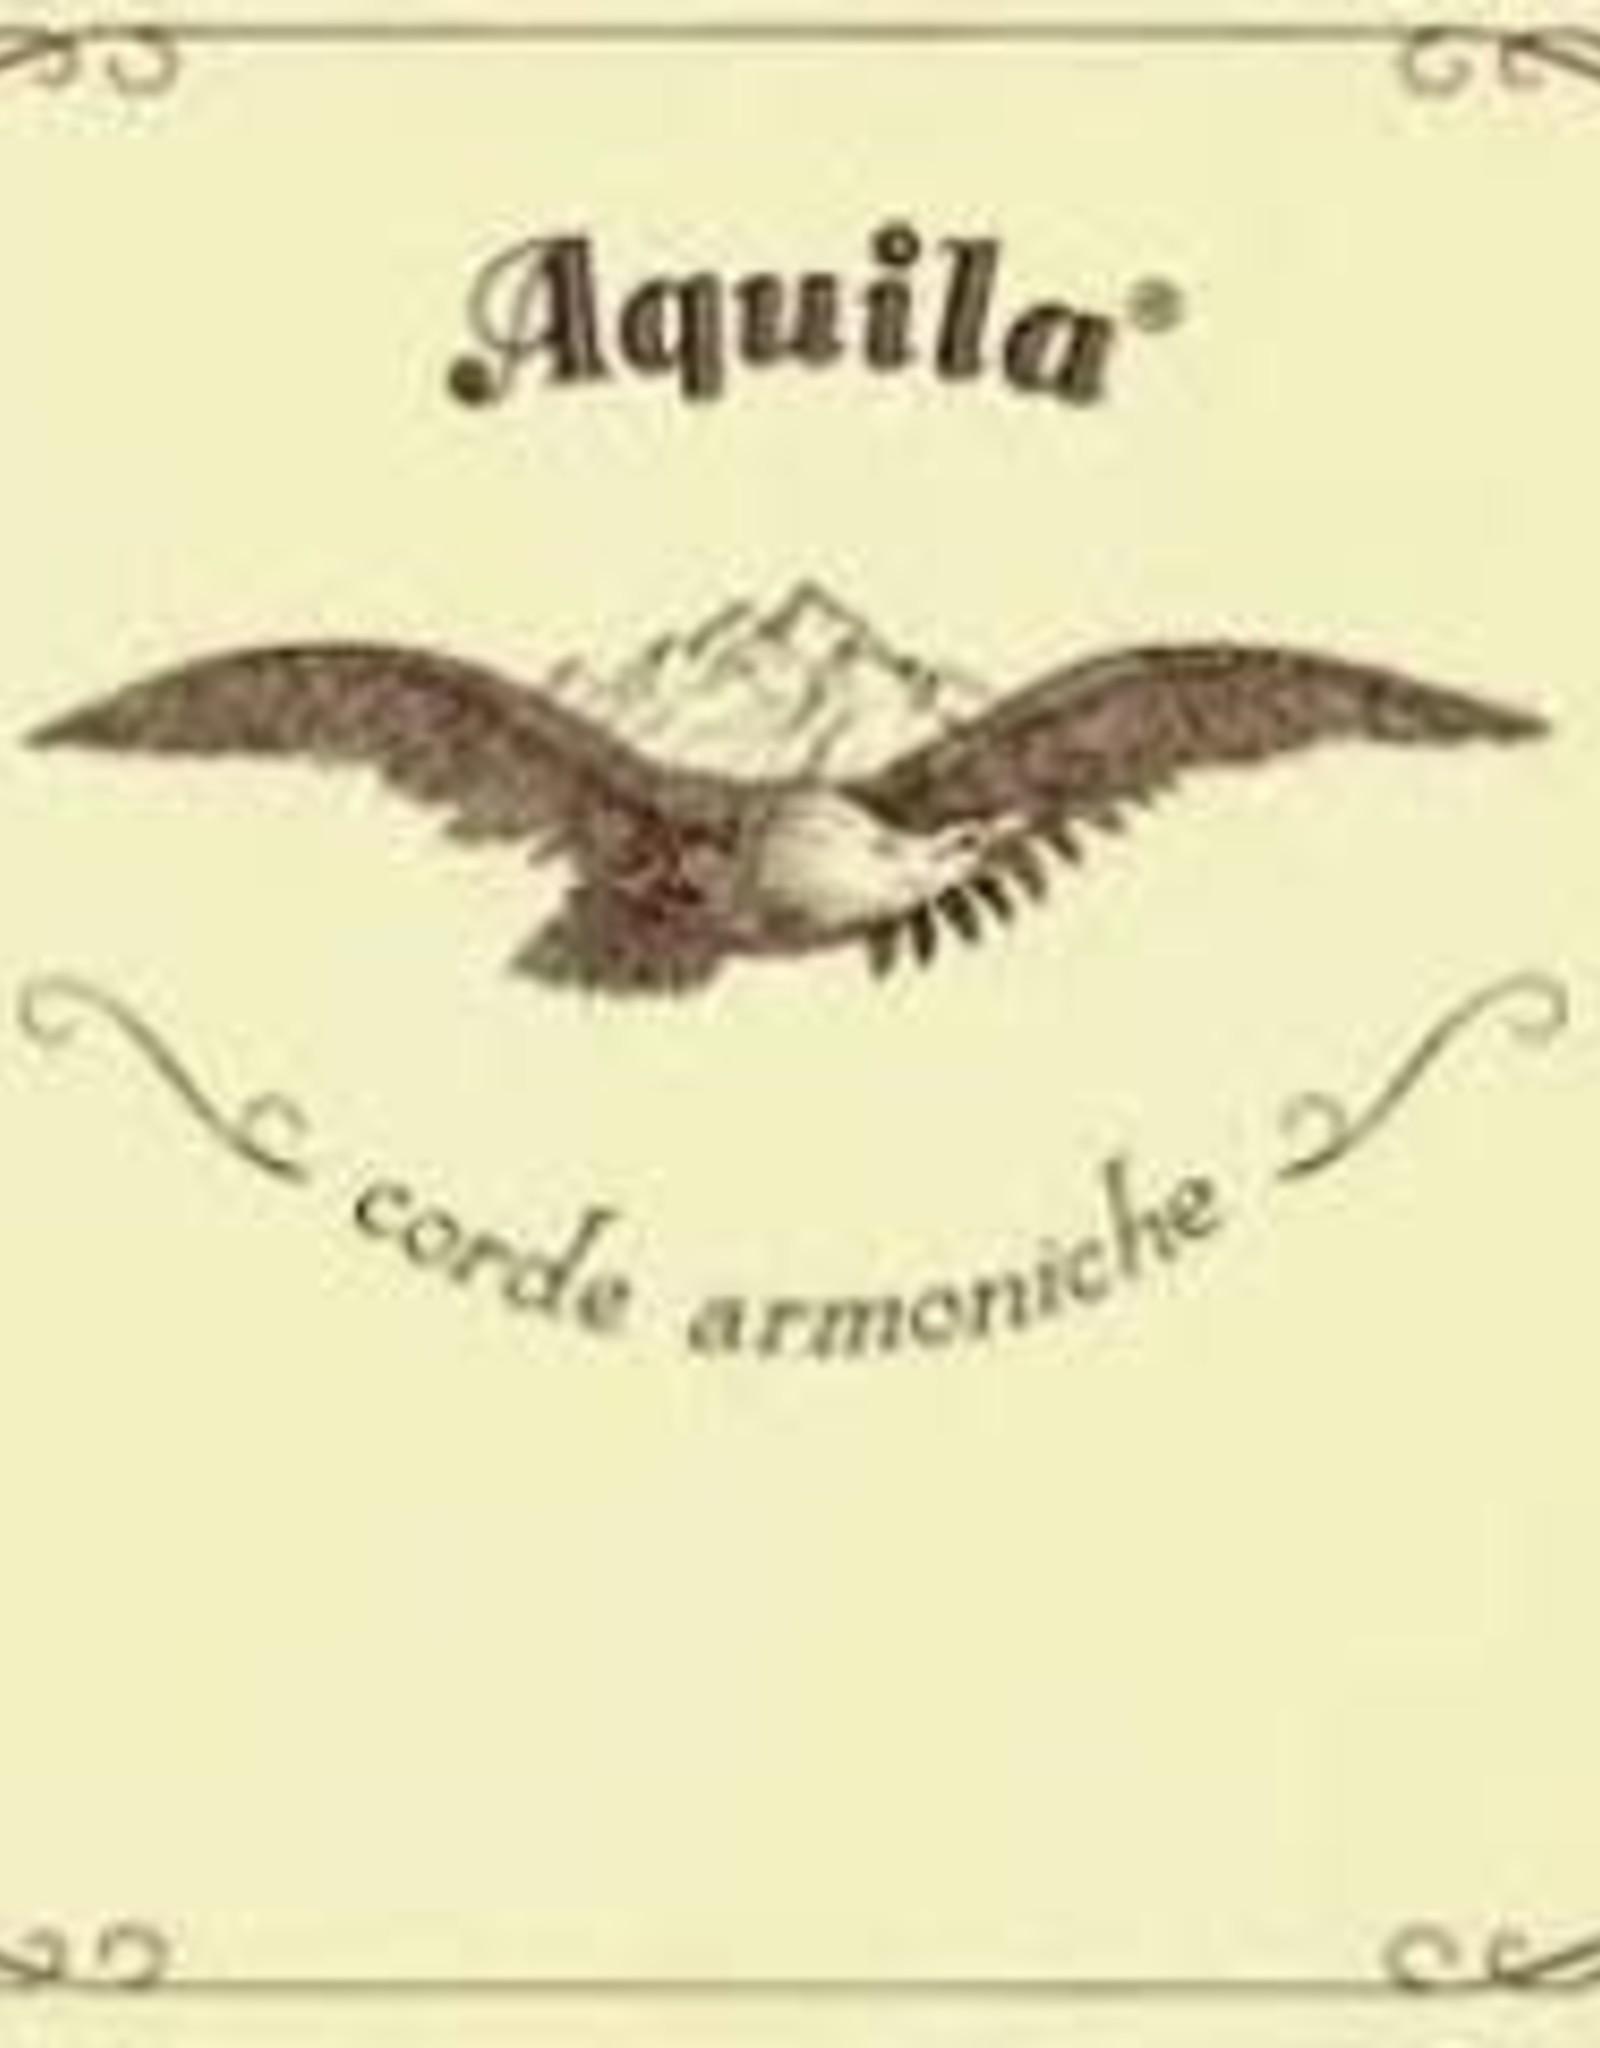 AQUILA new nylgut 94